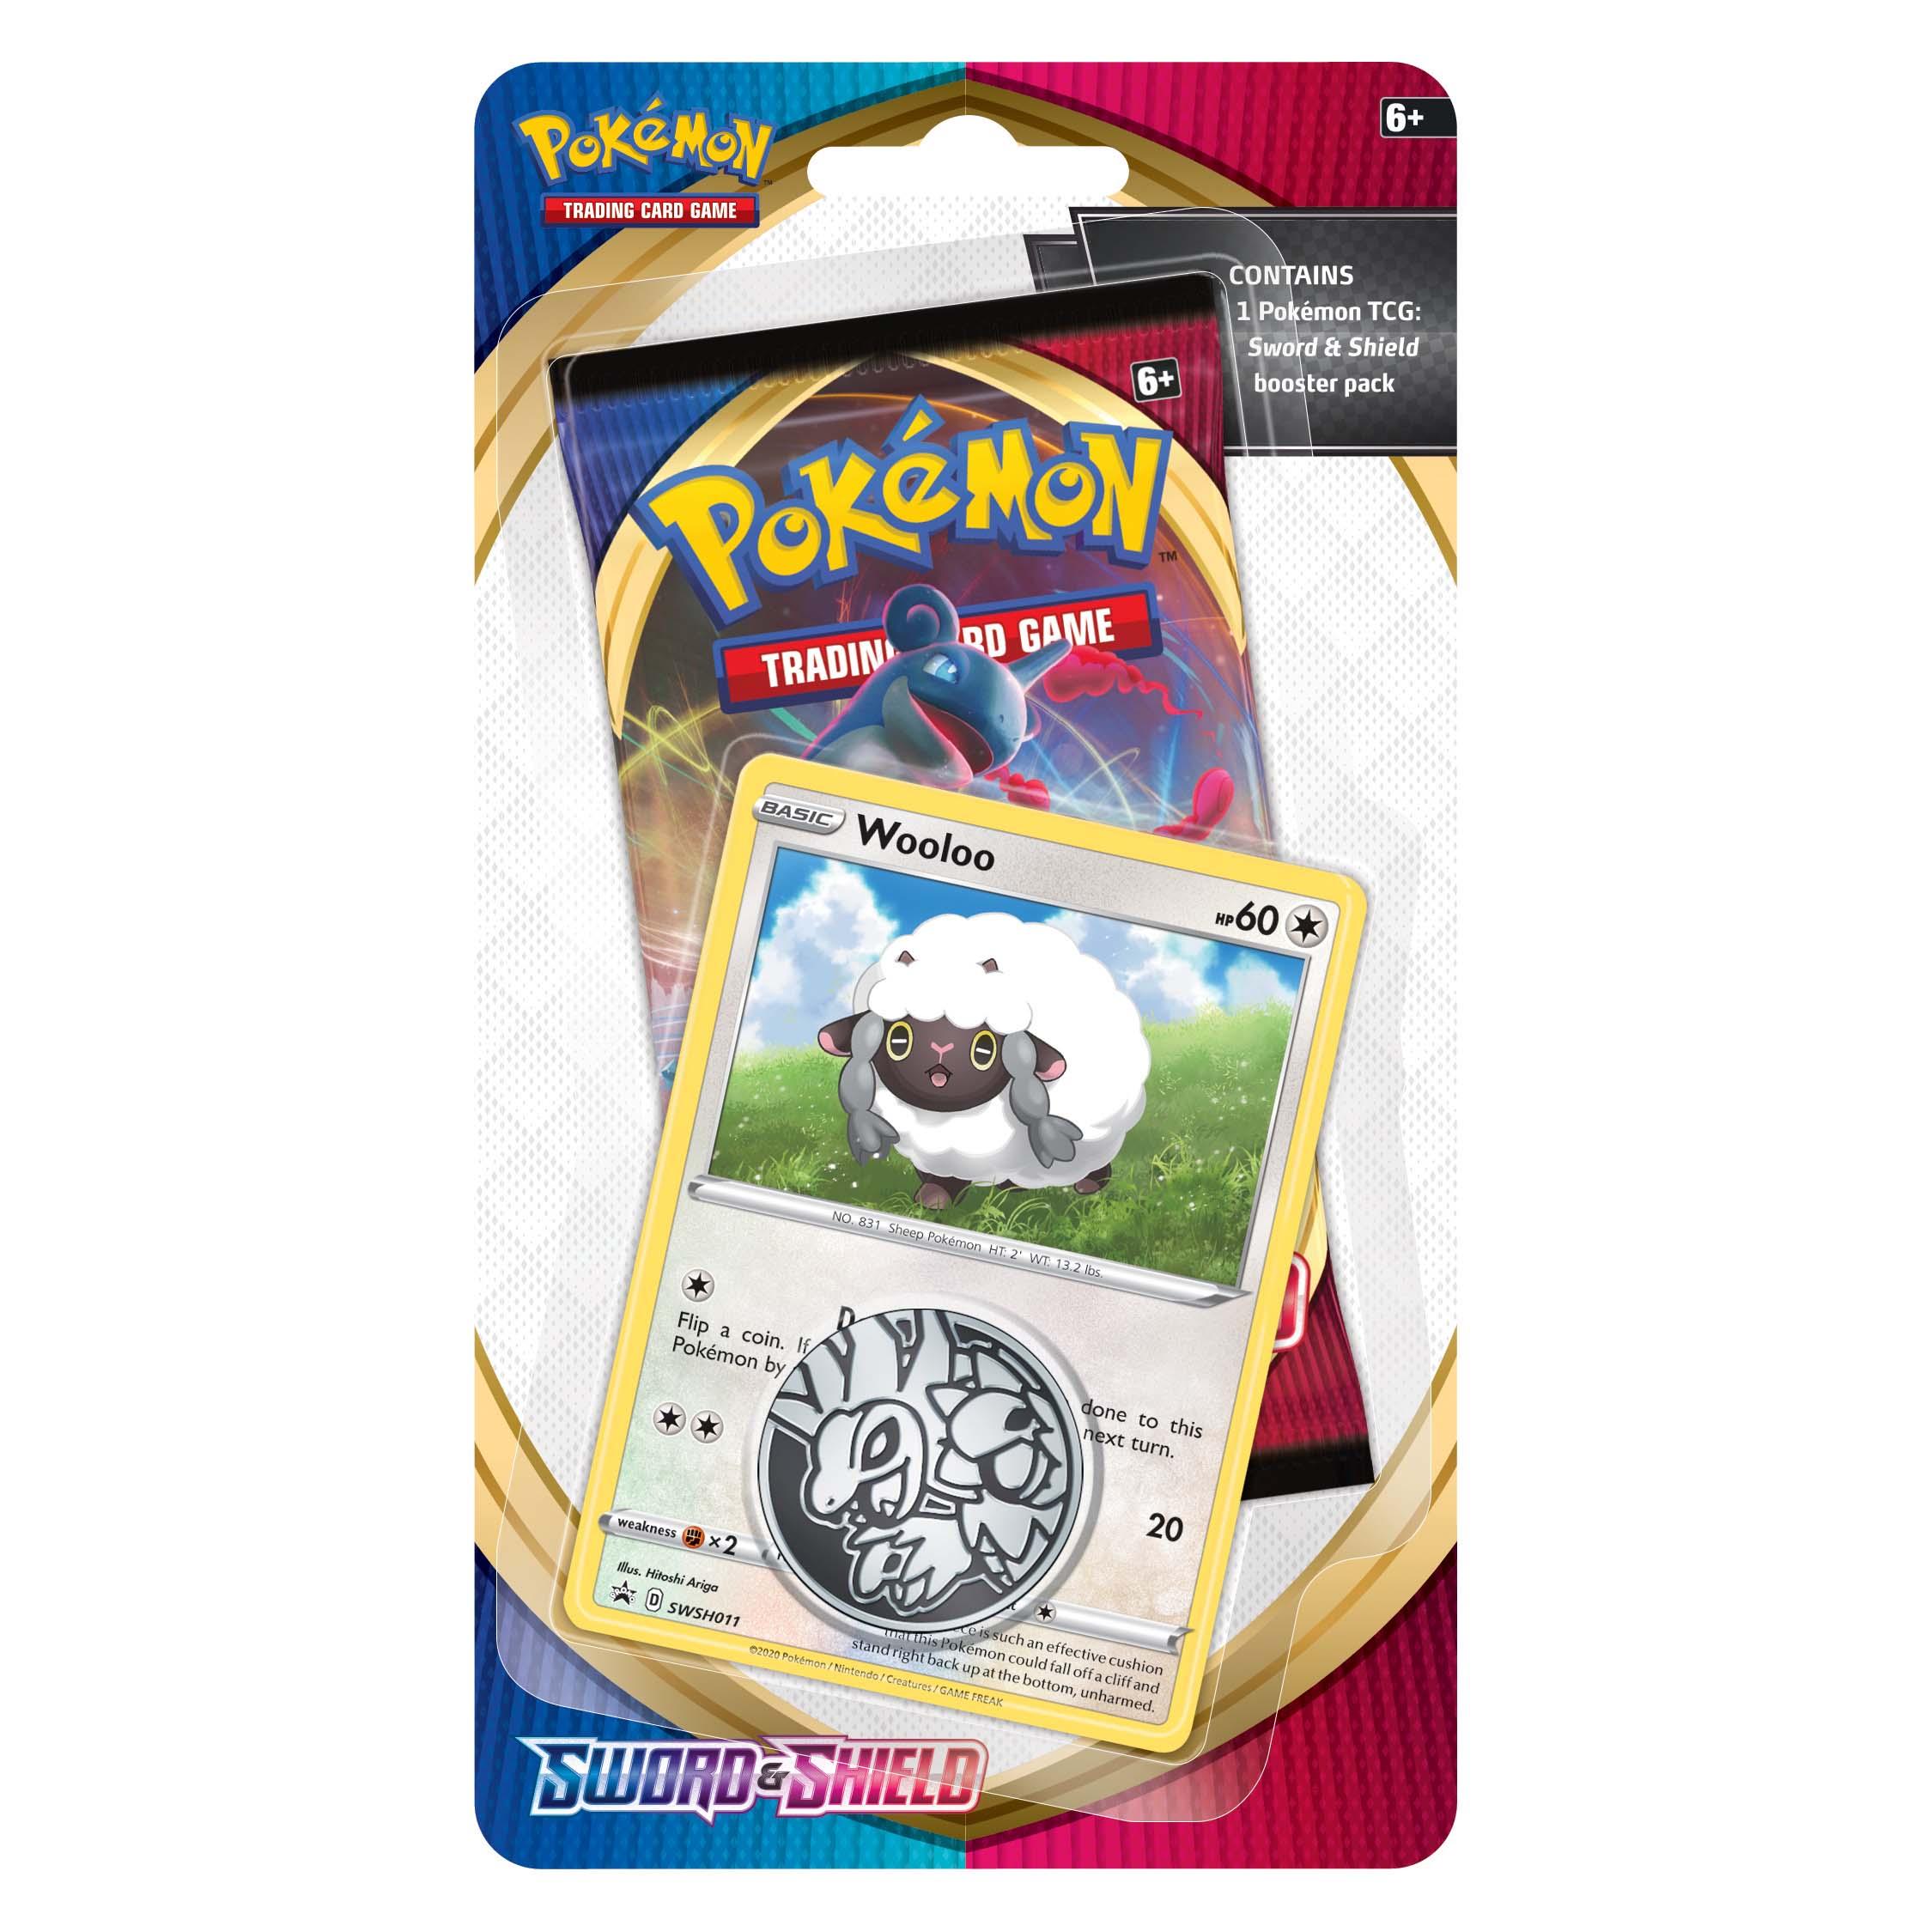 Afbeelding van Pokémon Sword & Shield Checklane Blister